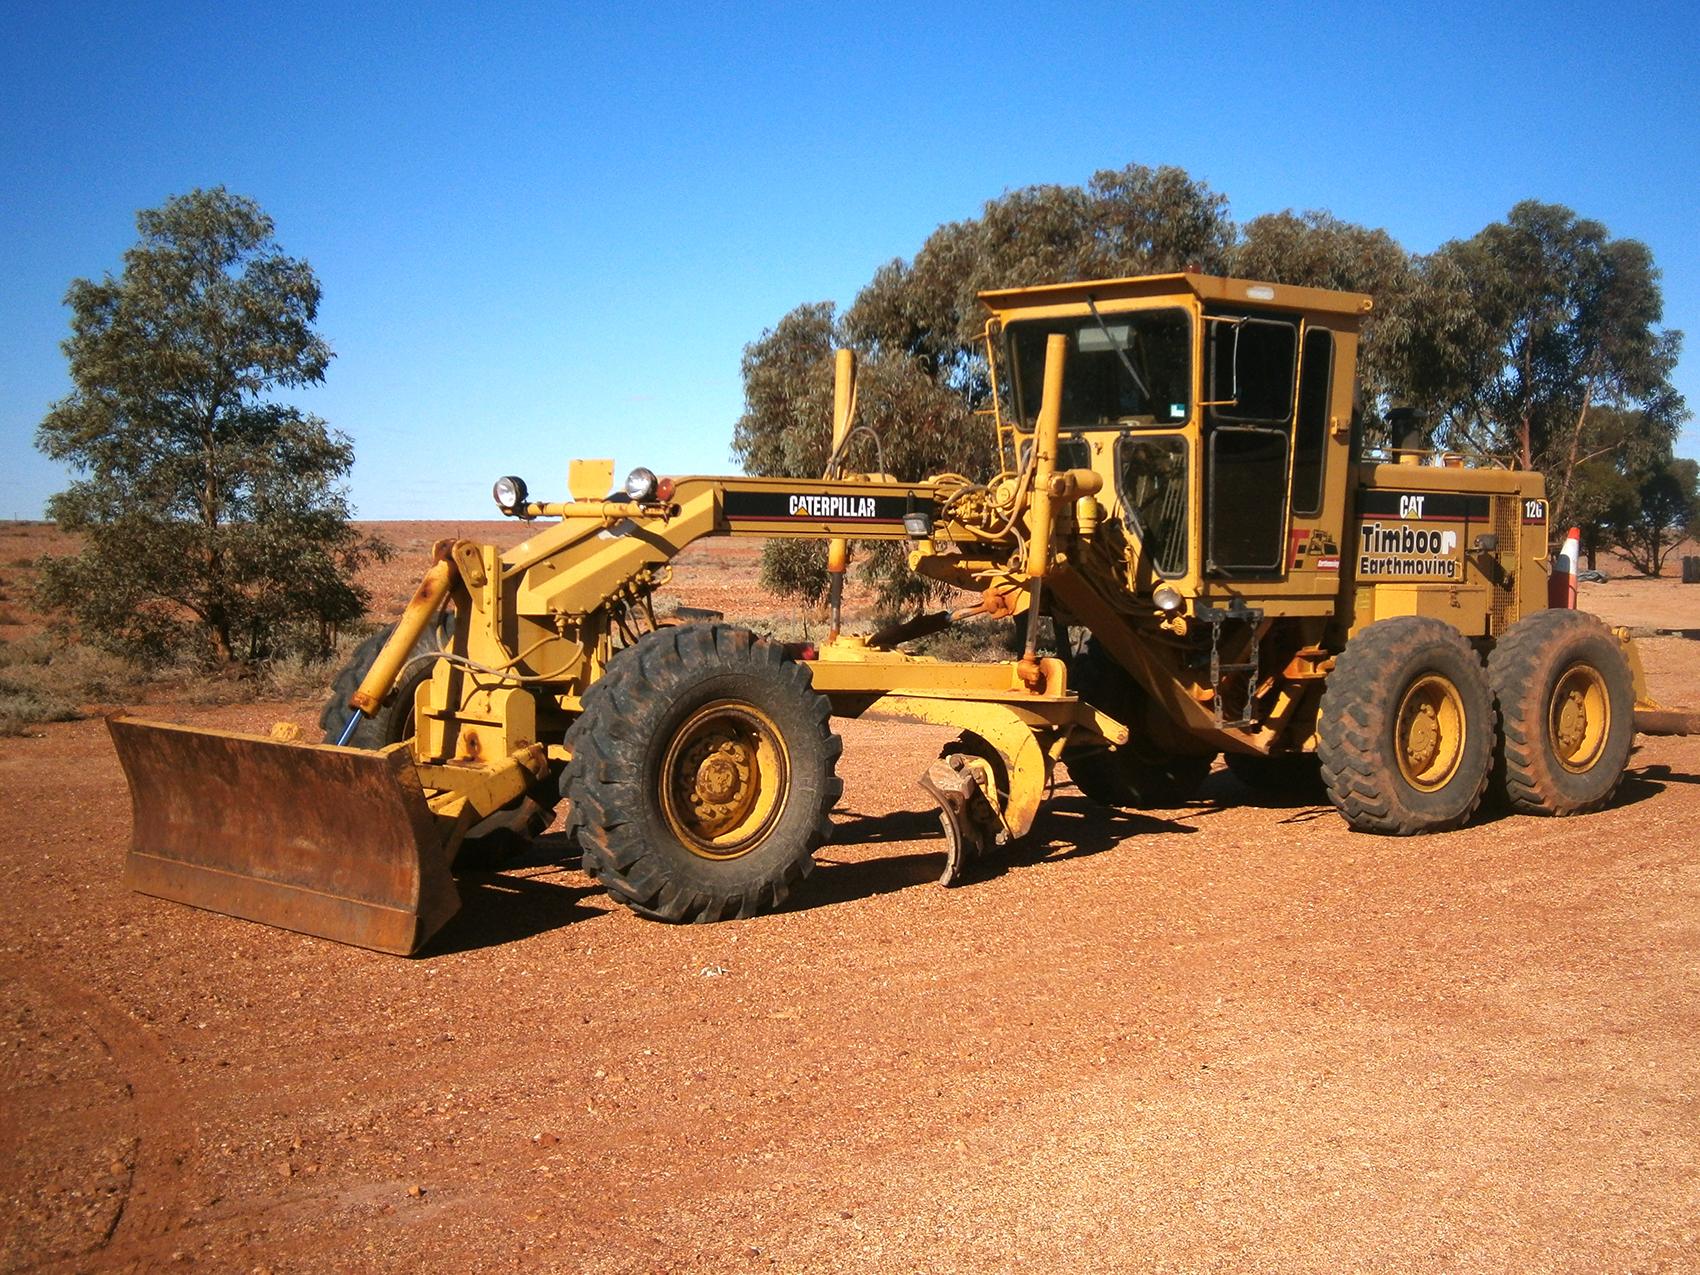 williams-cattle-company-mount-barry-station-south-australia-australia-cattle-station-sa-plant-and-equipment-12-g-cat-grader.jpg